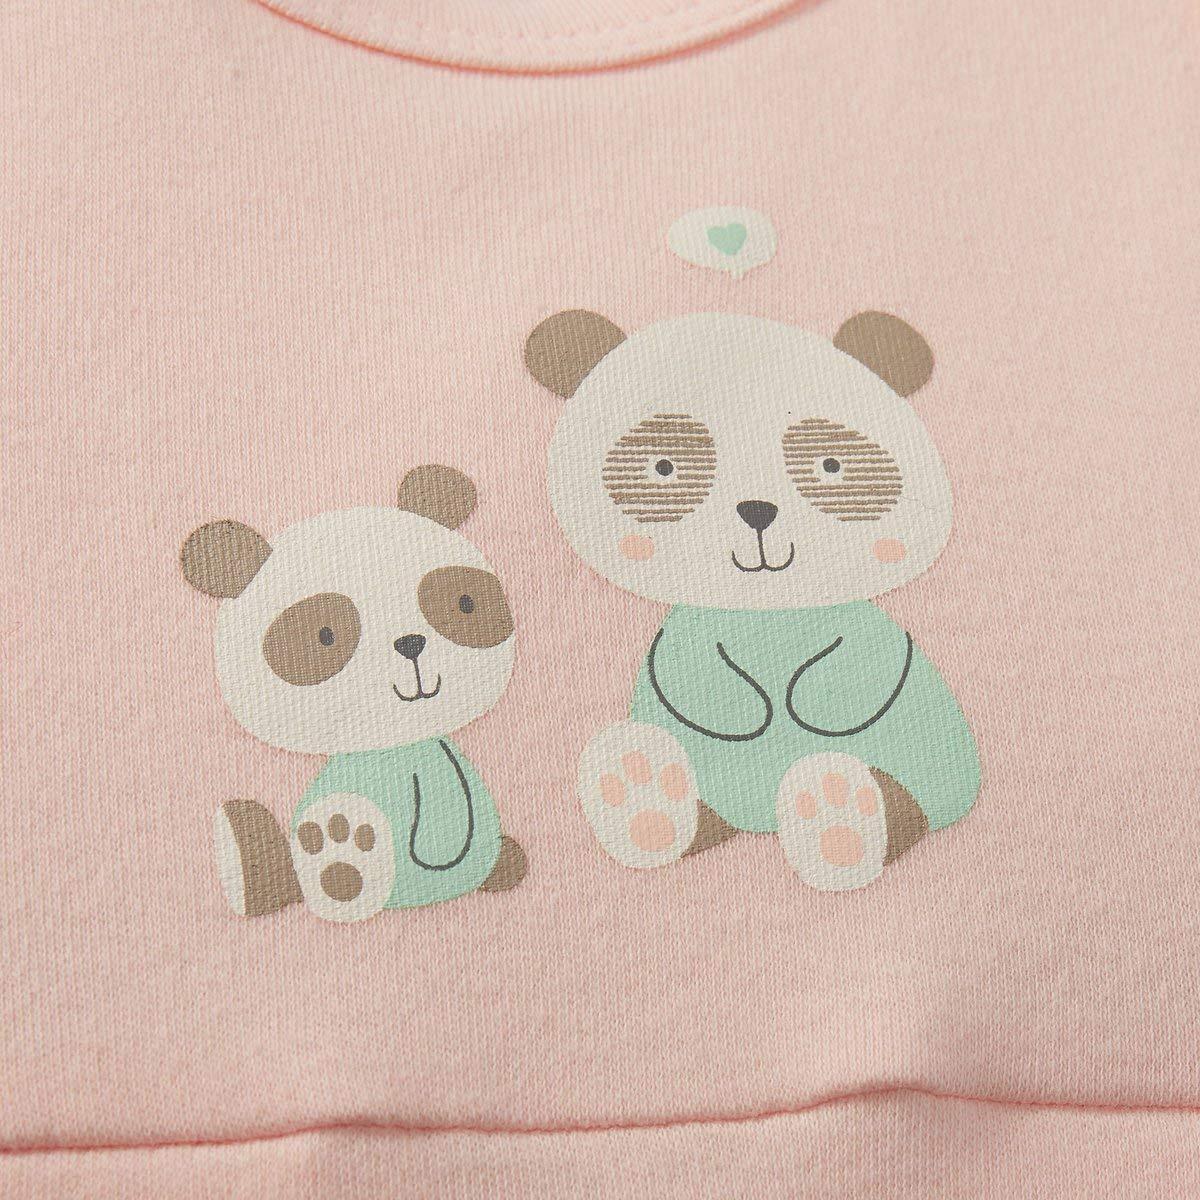 - gepunktetes Langarmshirt /& rosafarbener Strampelanzug mit gepunkteten Falten am Saum /& F/ü/ßchen 2-TLG. Bornino Strampler-Set Panda Offwhite//rosa